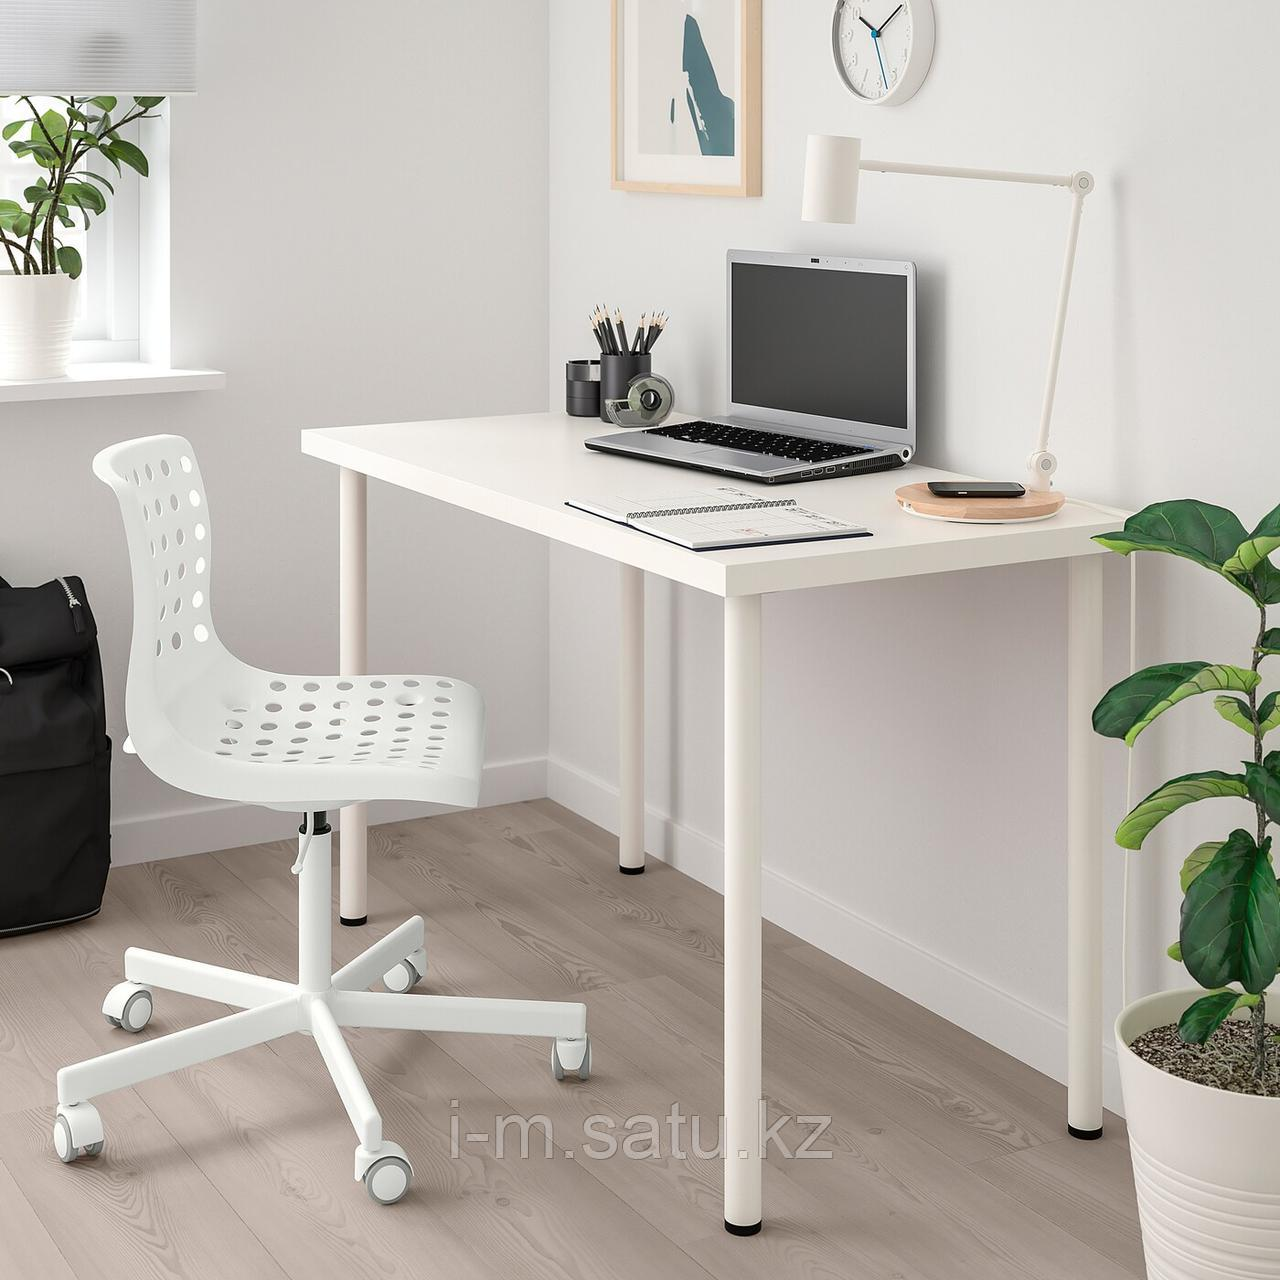 СКОЛБЕРГ / СПОРРЕН Рабочий стул, белый, белый